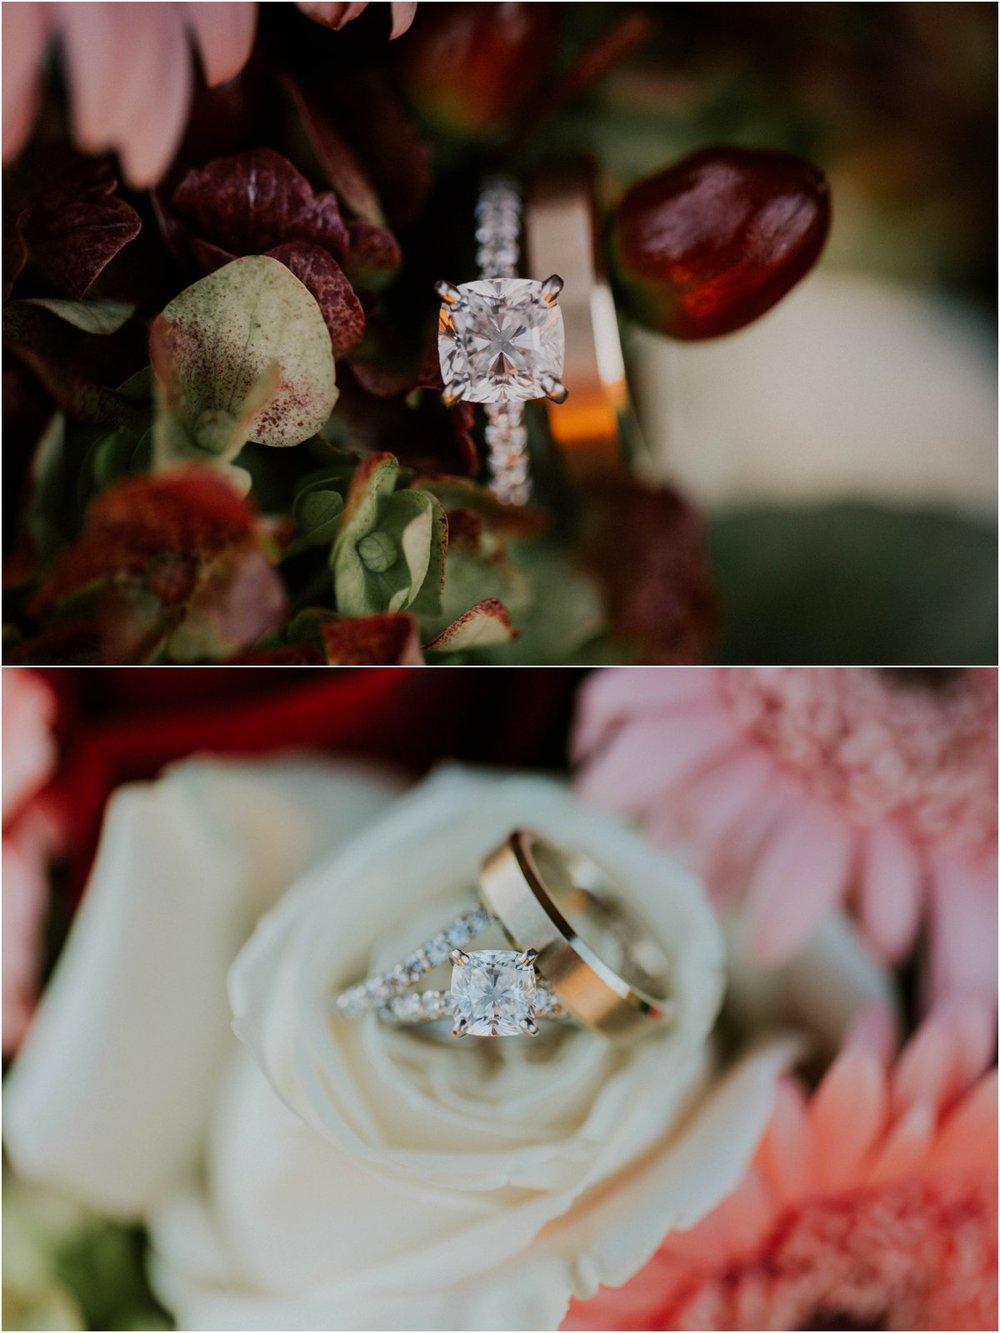 Lindsay + Tyler // Married 11/12/16 // Barn At Silverstone, Lancaster, PA |  Amanda Nichols, Lewisburg Based Wedding And Lifestyle Photographer